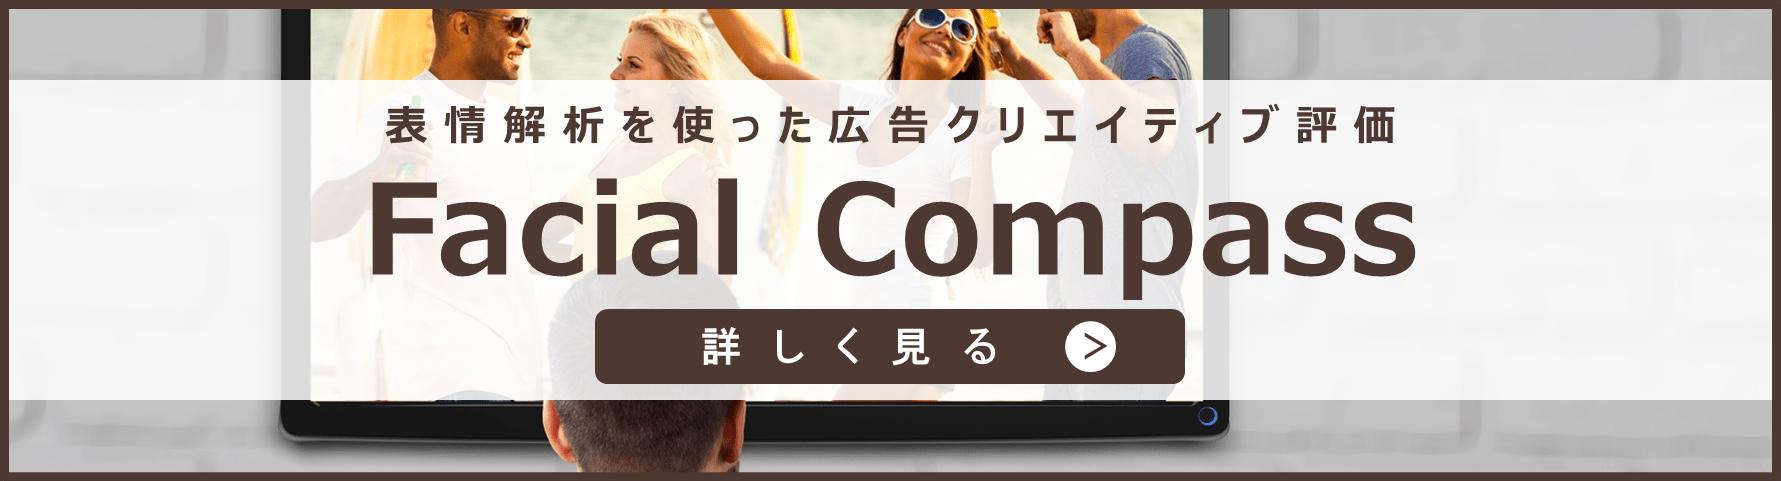 facial-coding_banner.png